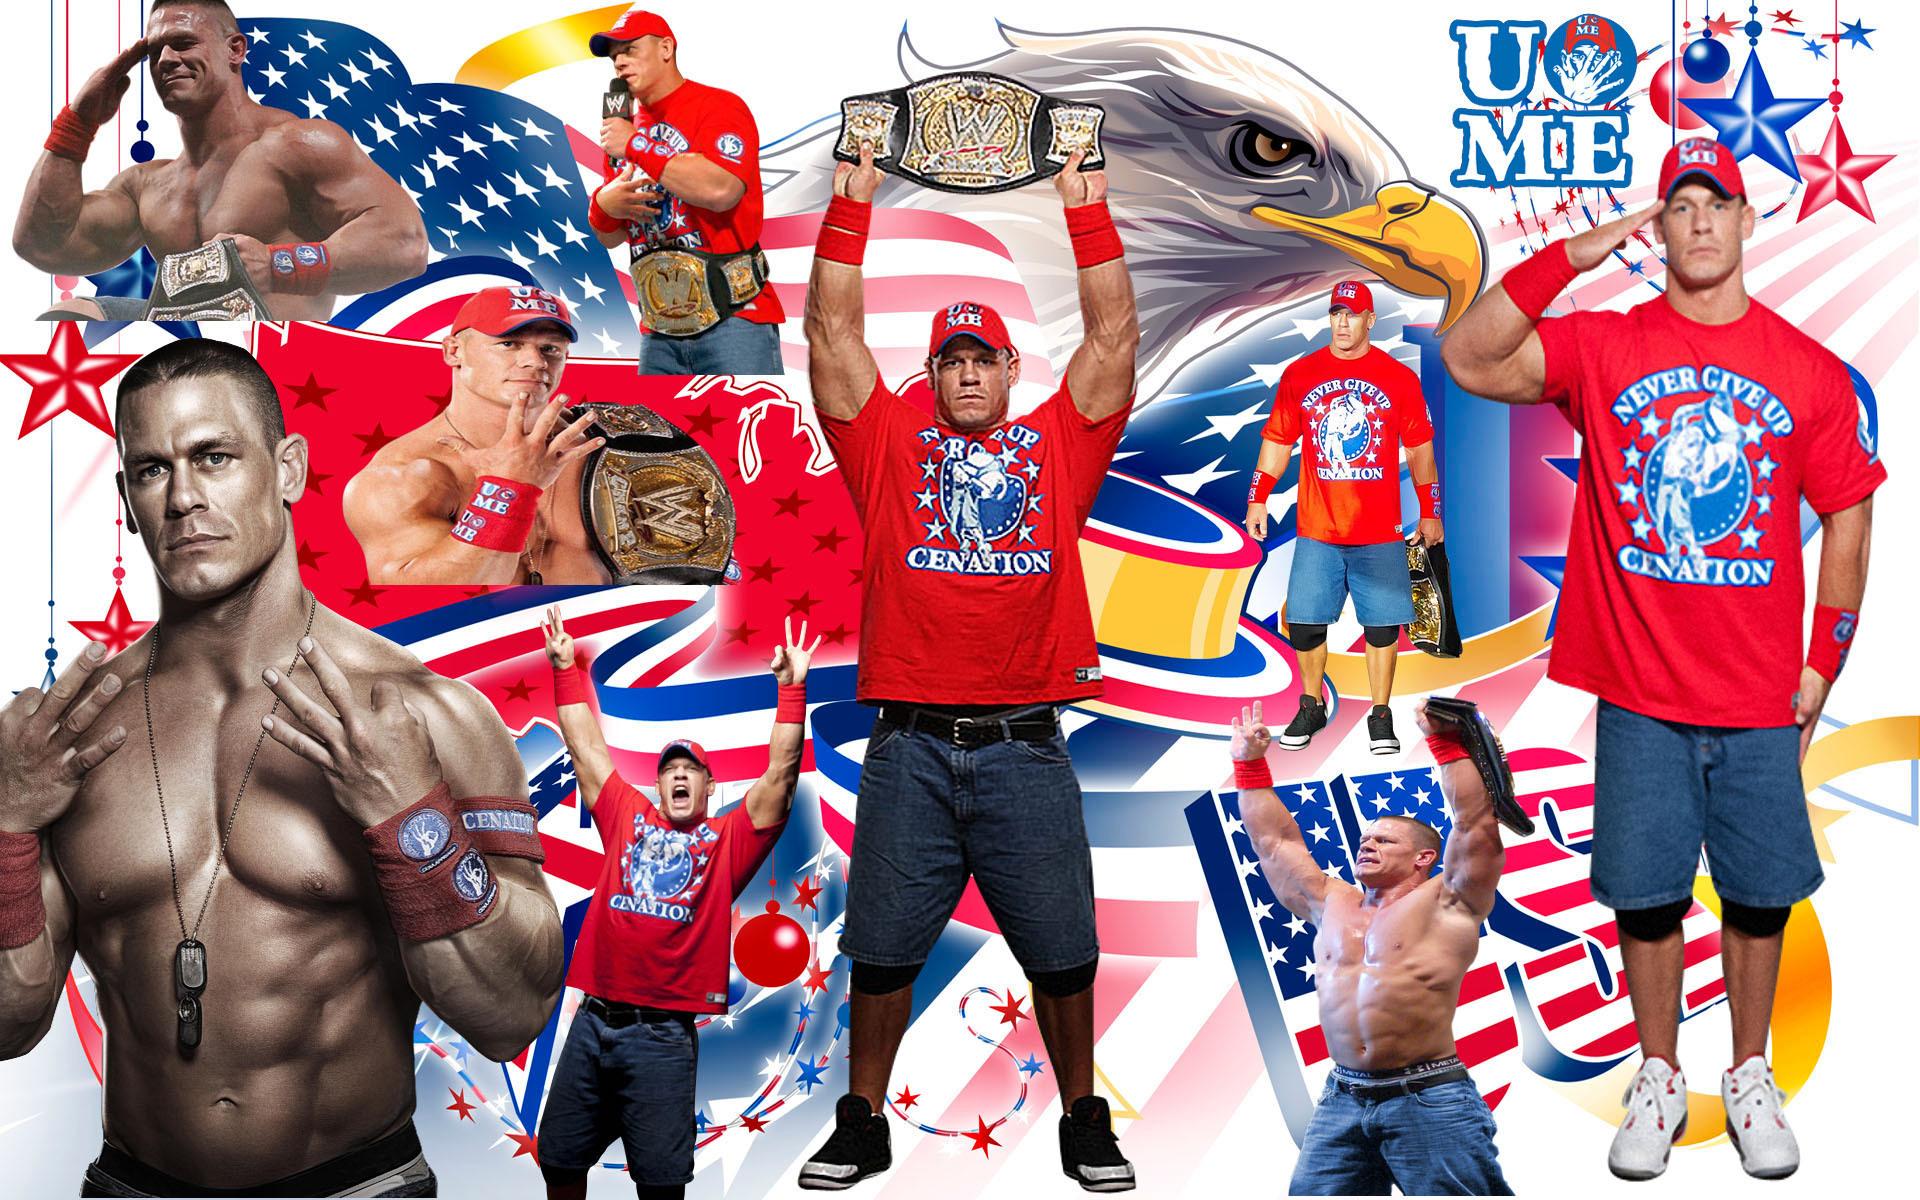 John Cena John Cena WWE Champ 4 Capital Punishment